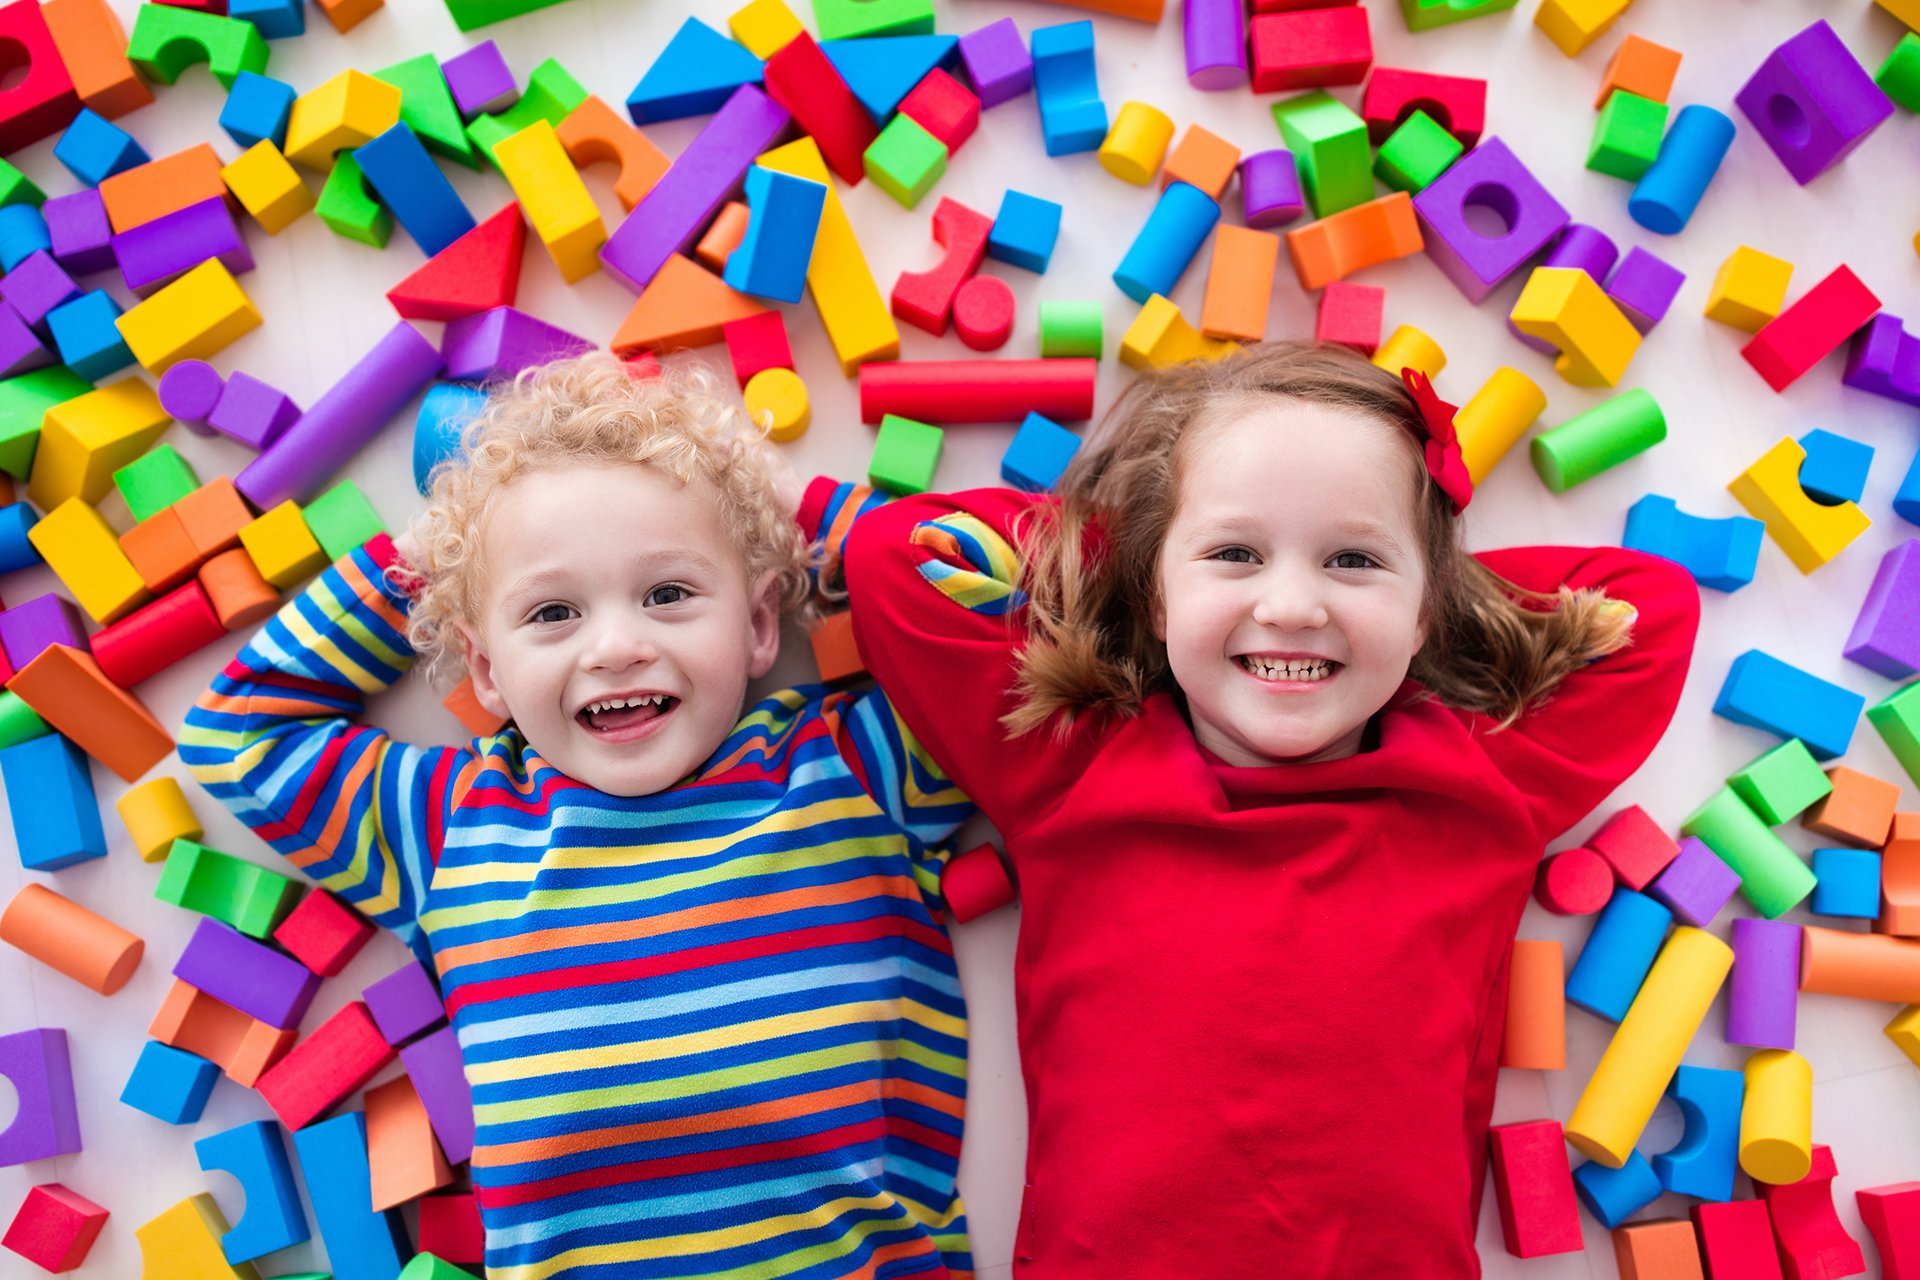 escuela infantil en ingles en Valencia - manualidades